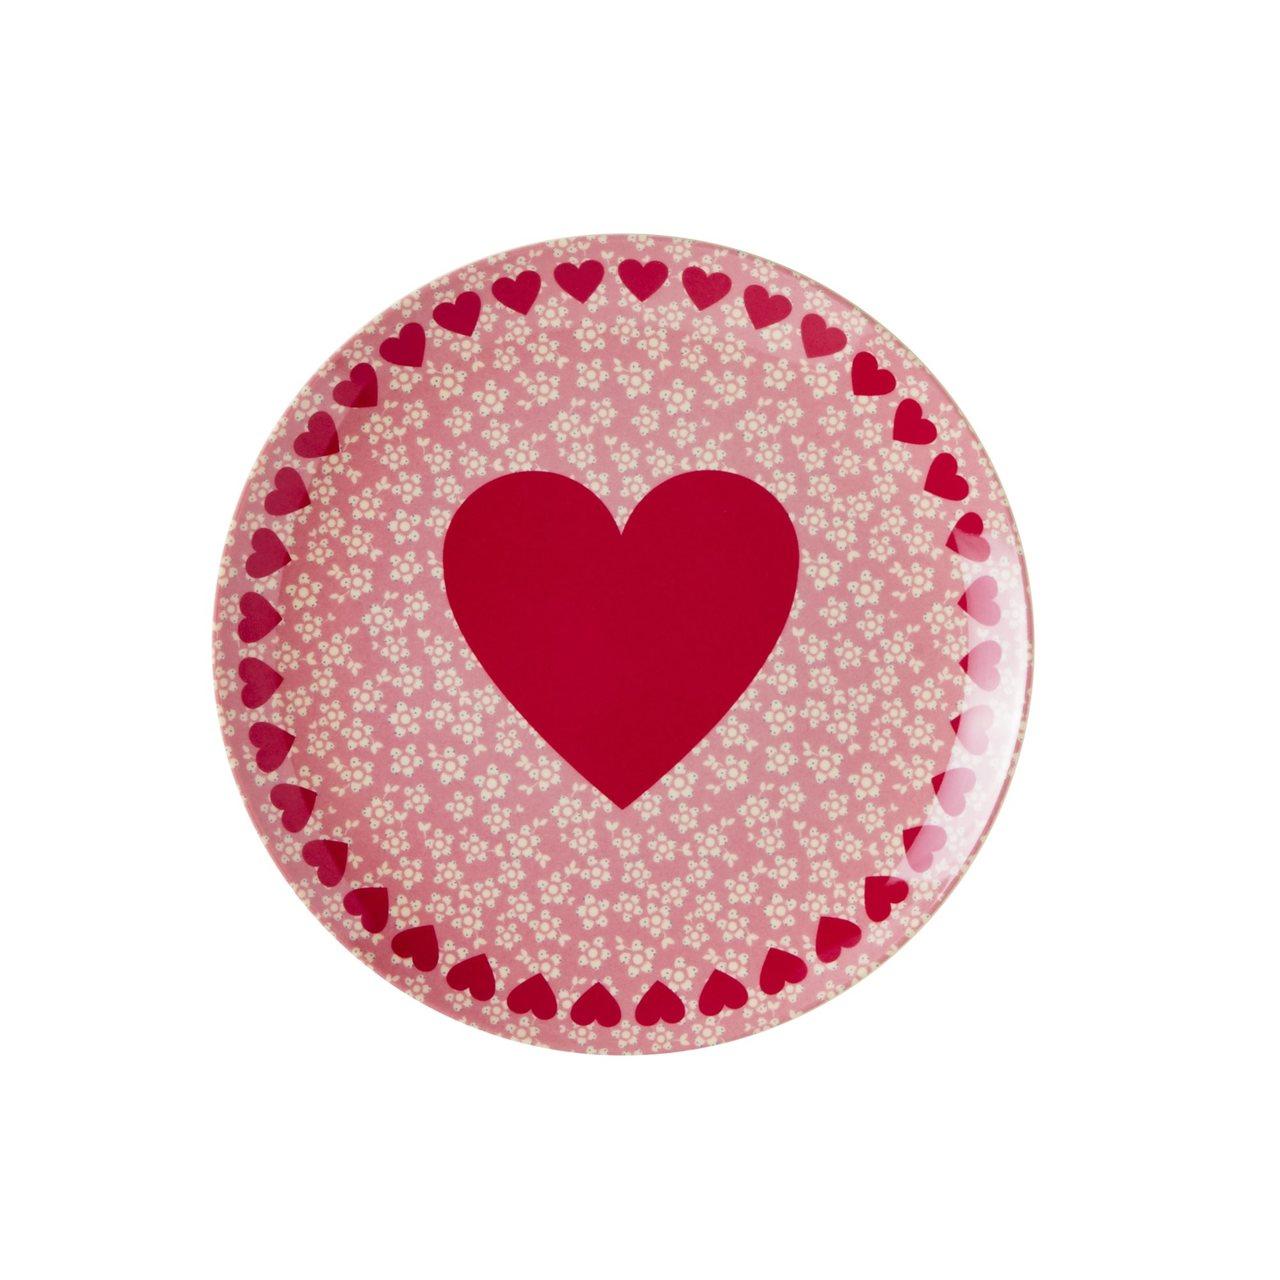 Melamine Dessert Plate with Heart Print